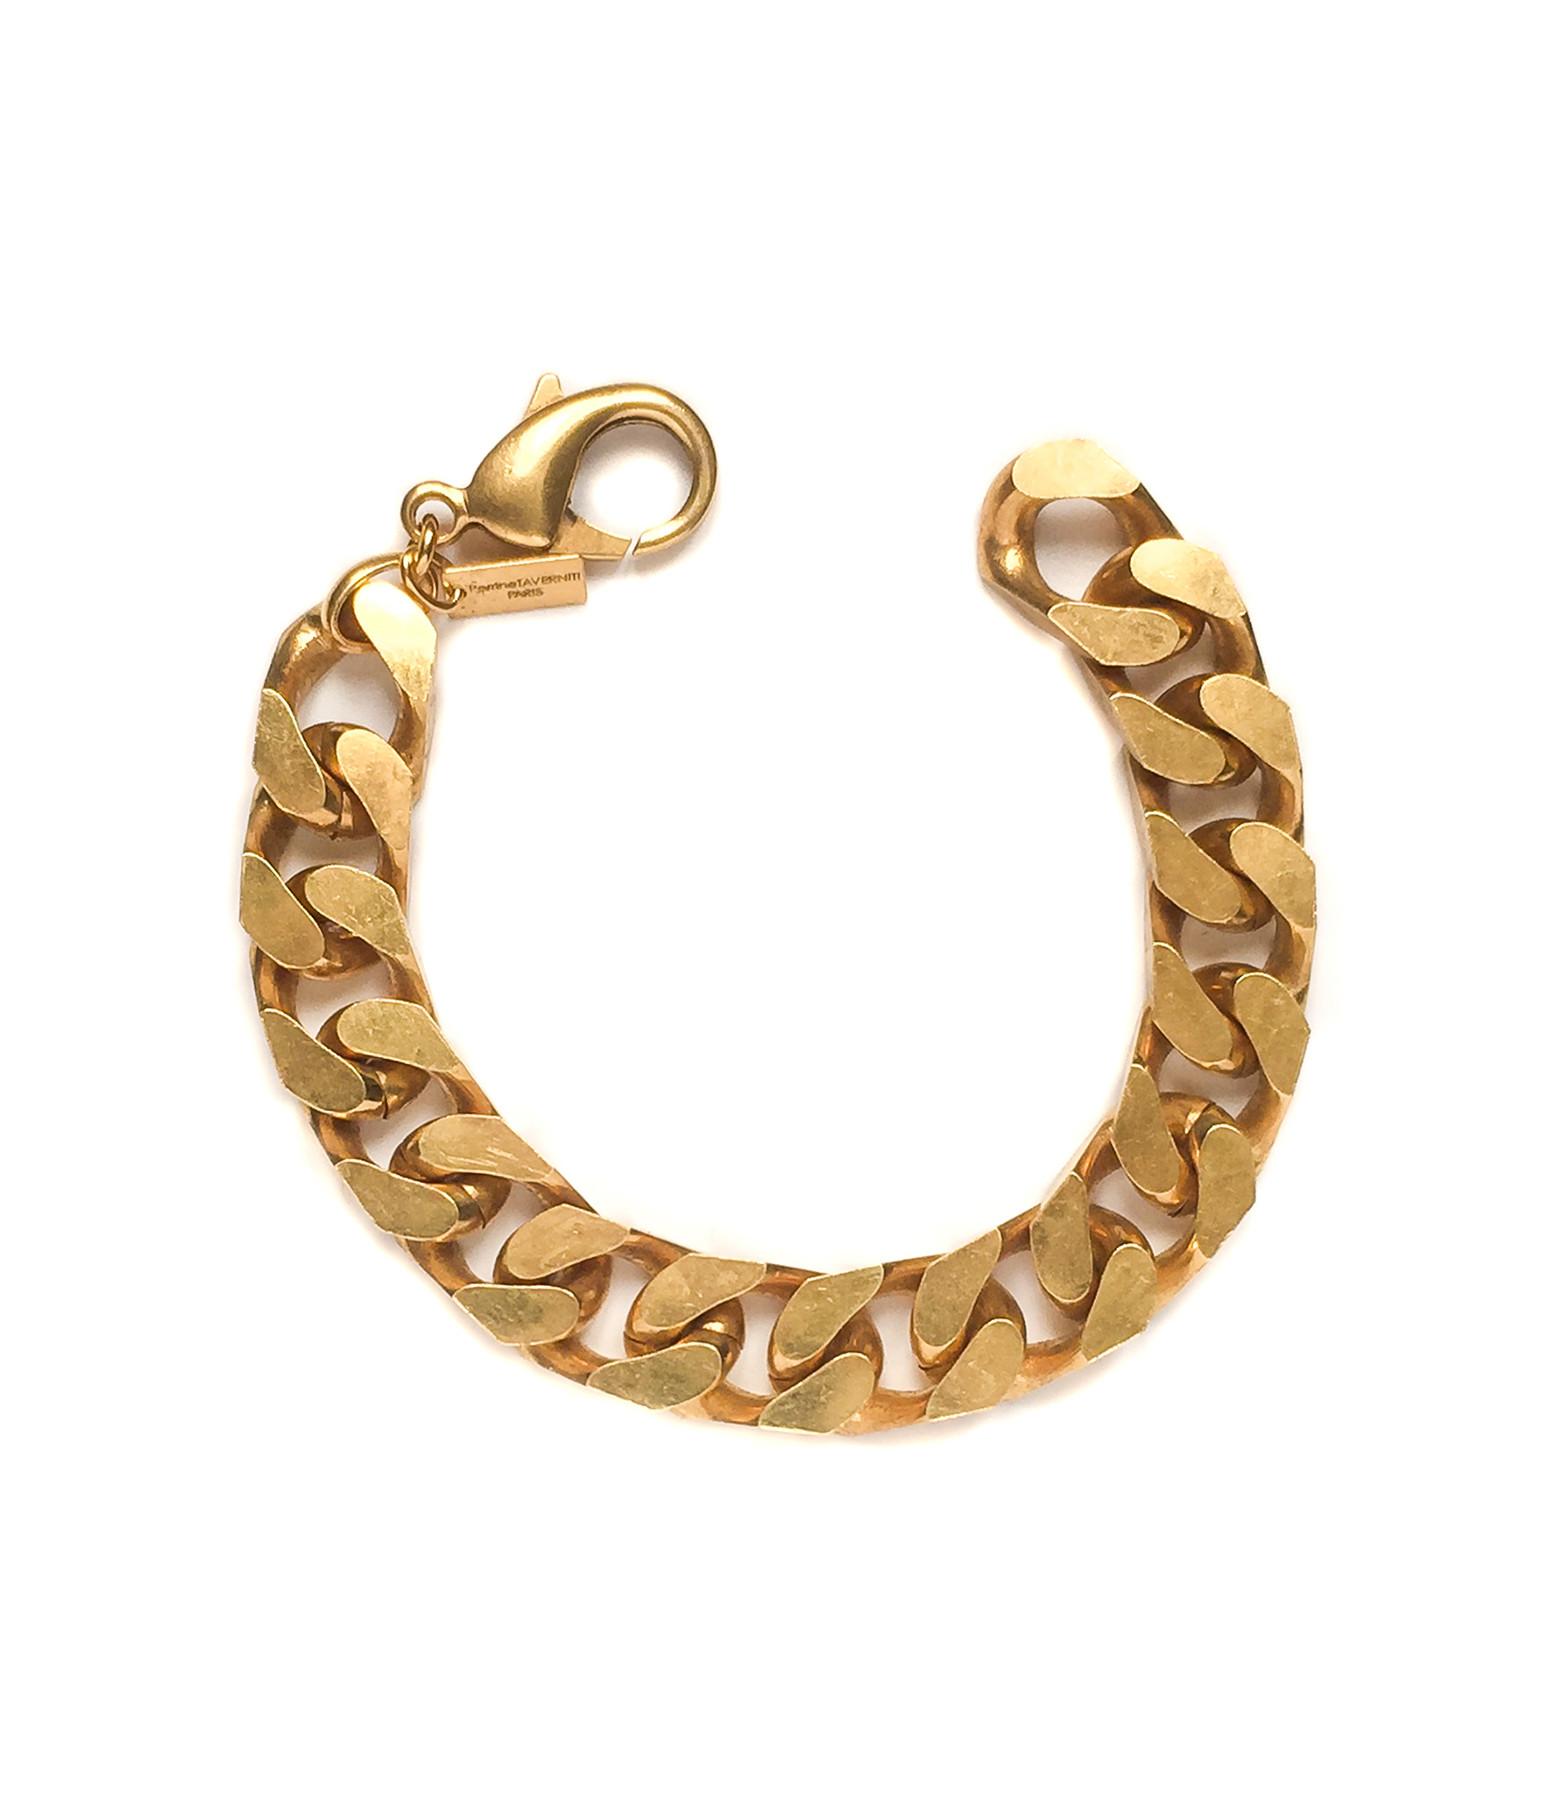 PERRINE TAVERNITI - Bracelet Cardinet Plaqué Or